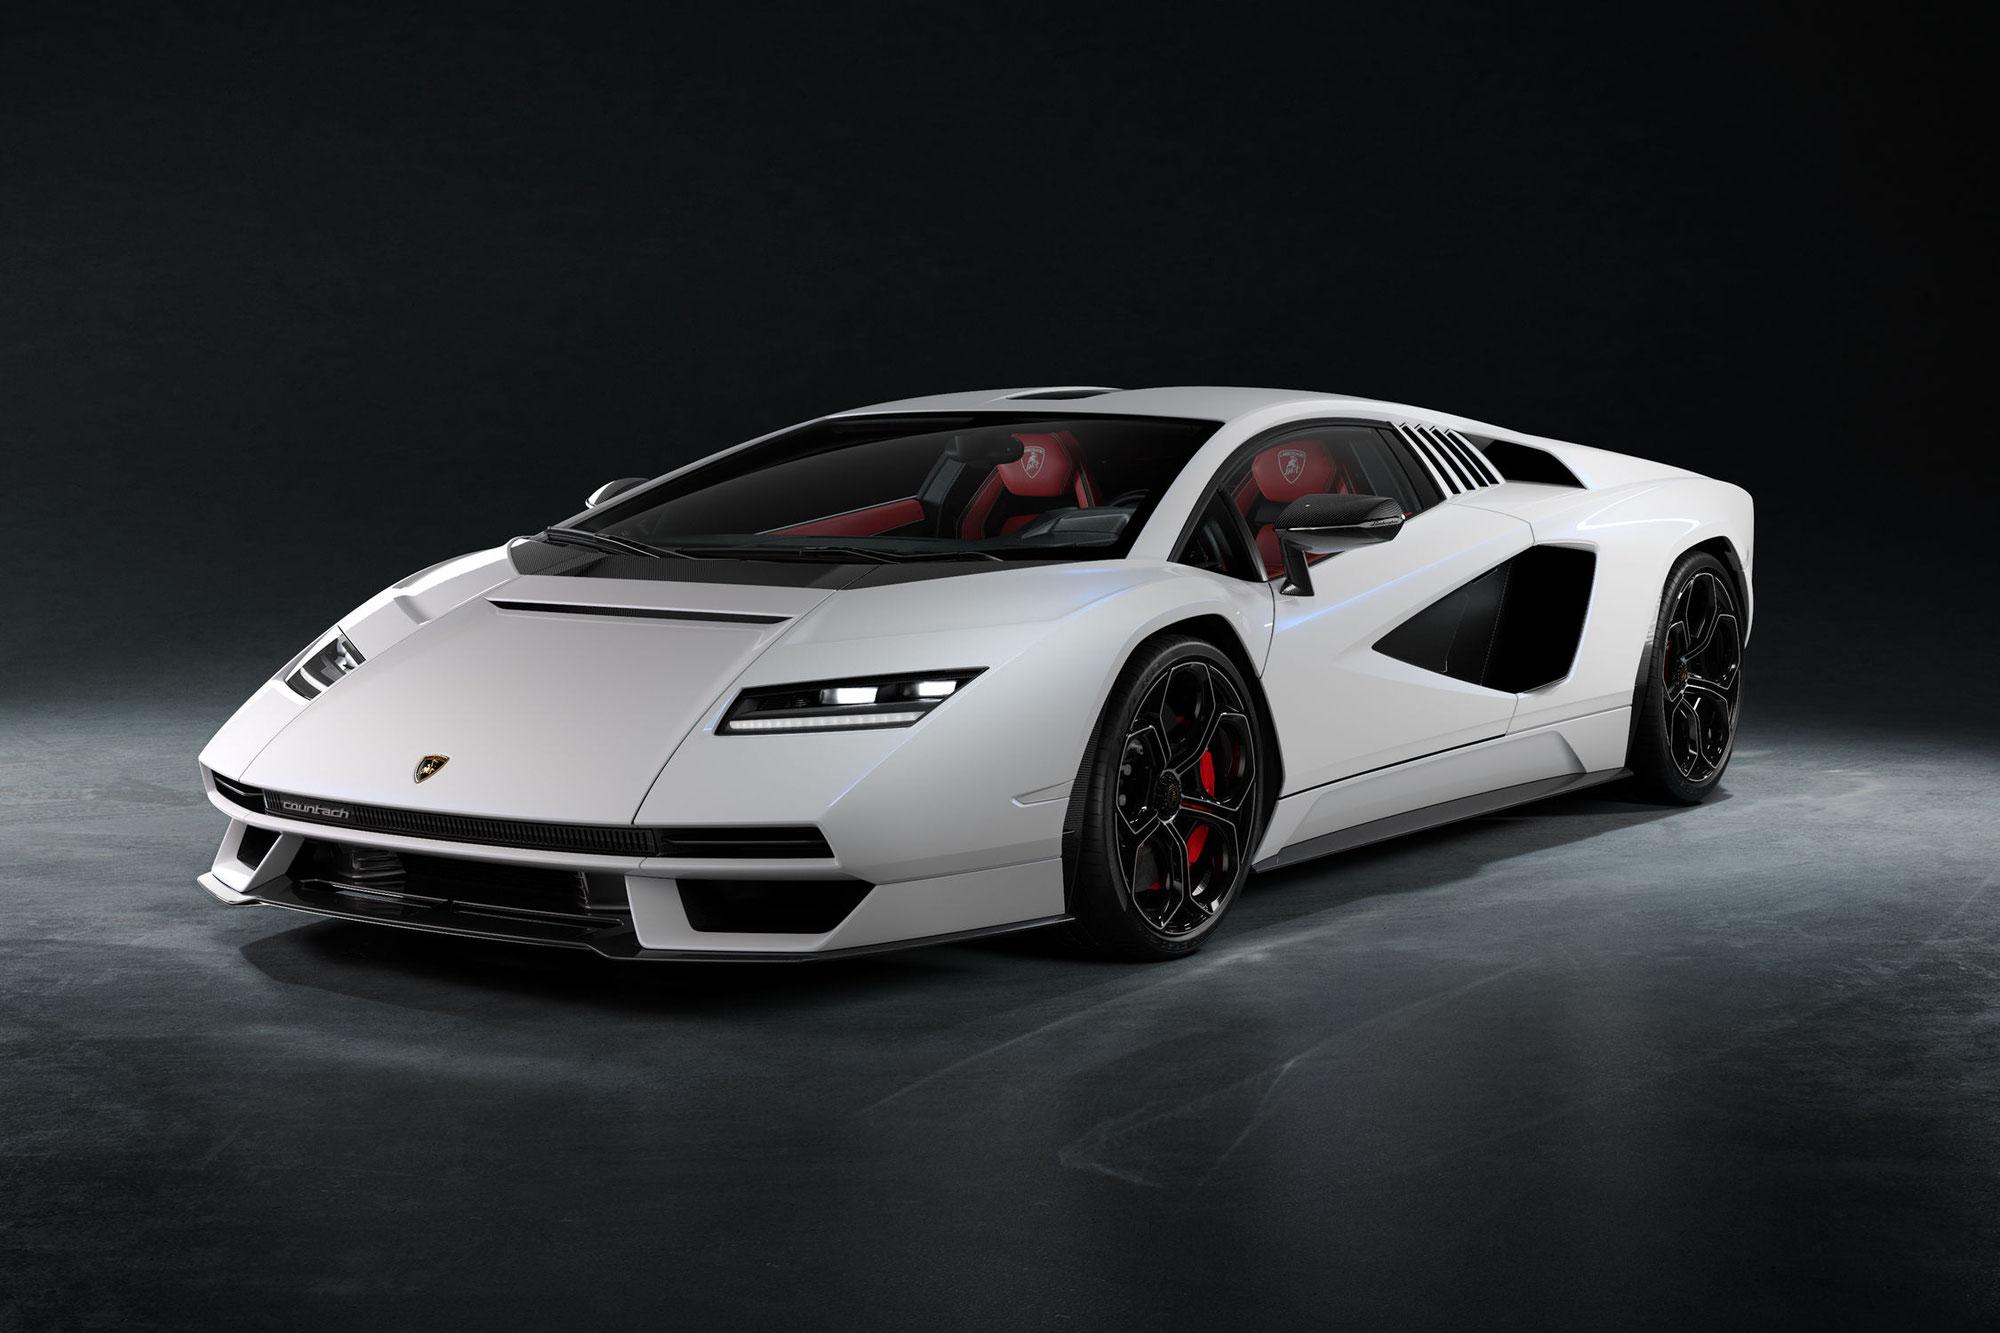 Lamborghini Countach LPI 800-4 : Retour vers le futur !